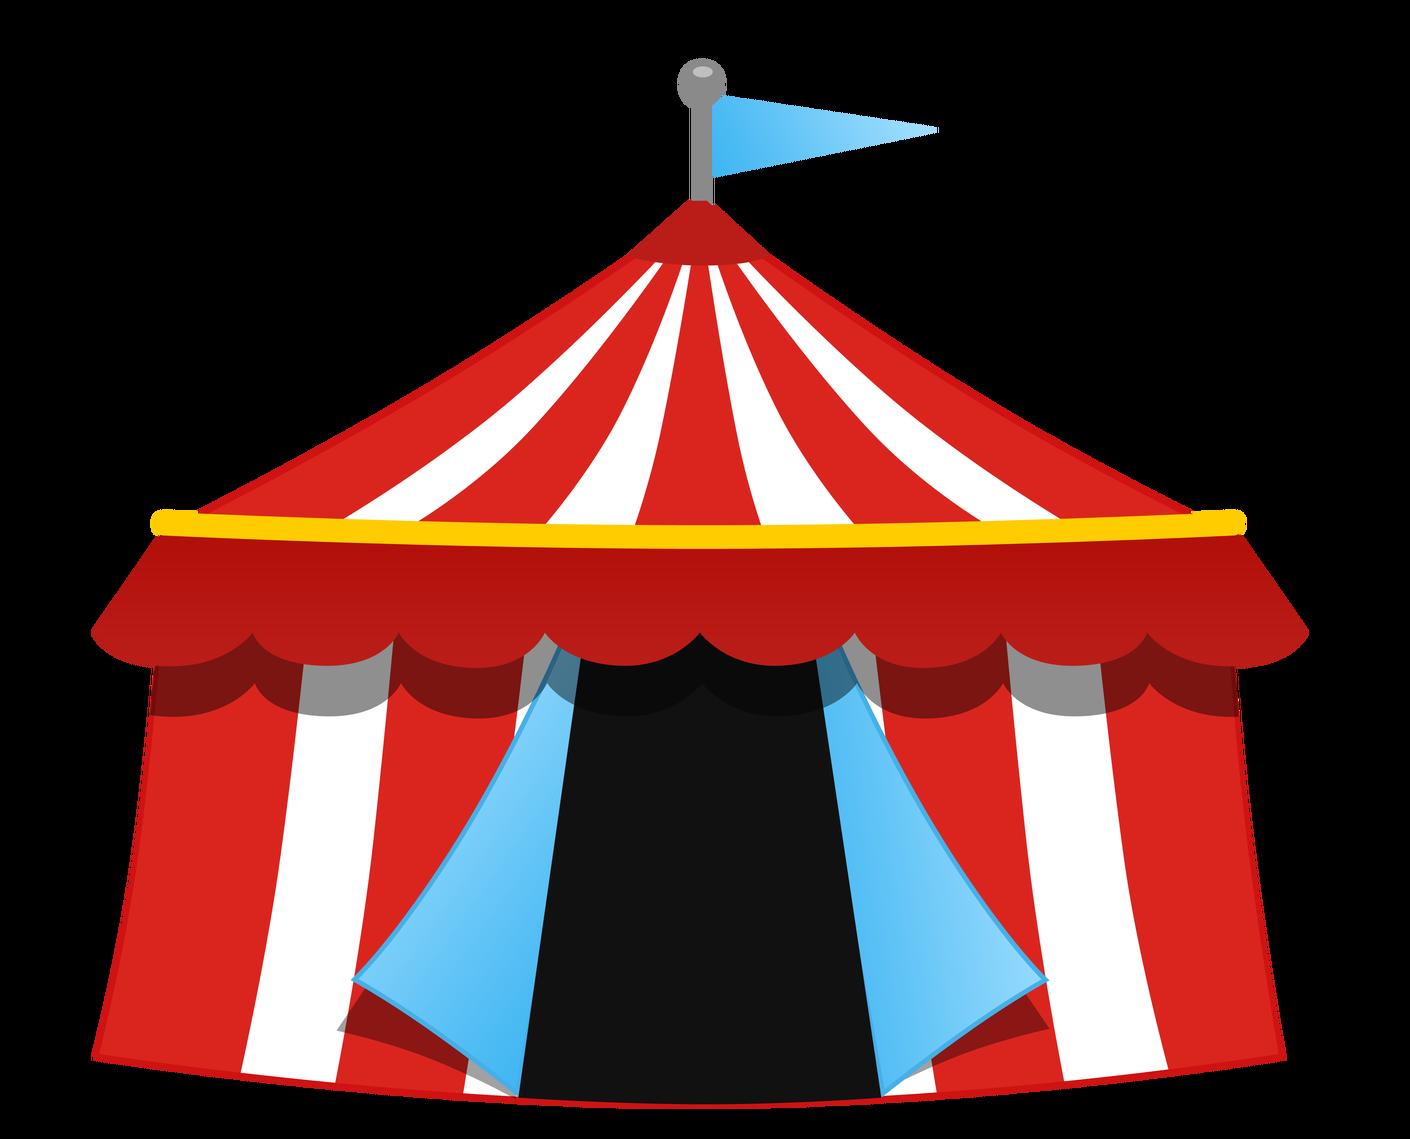 fair clipart event tent